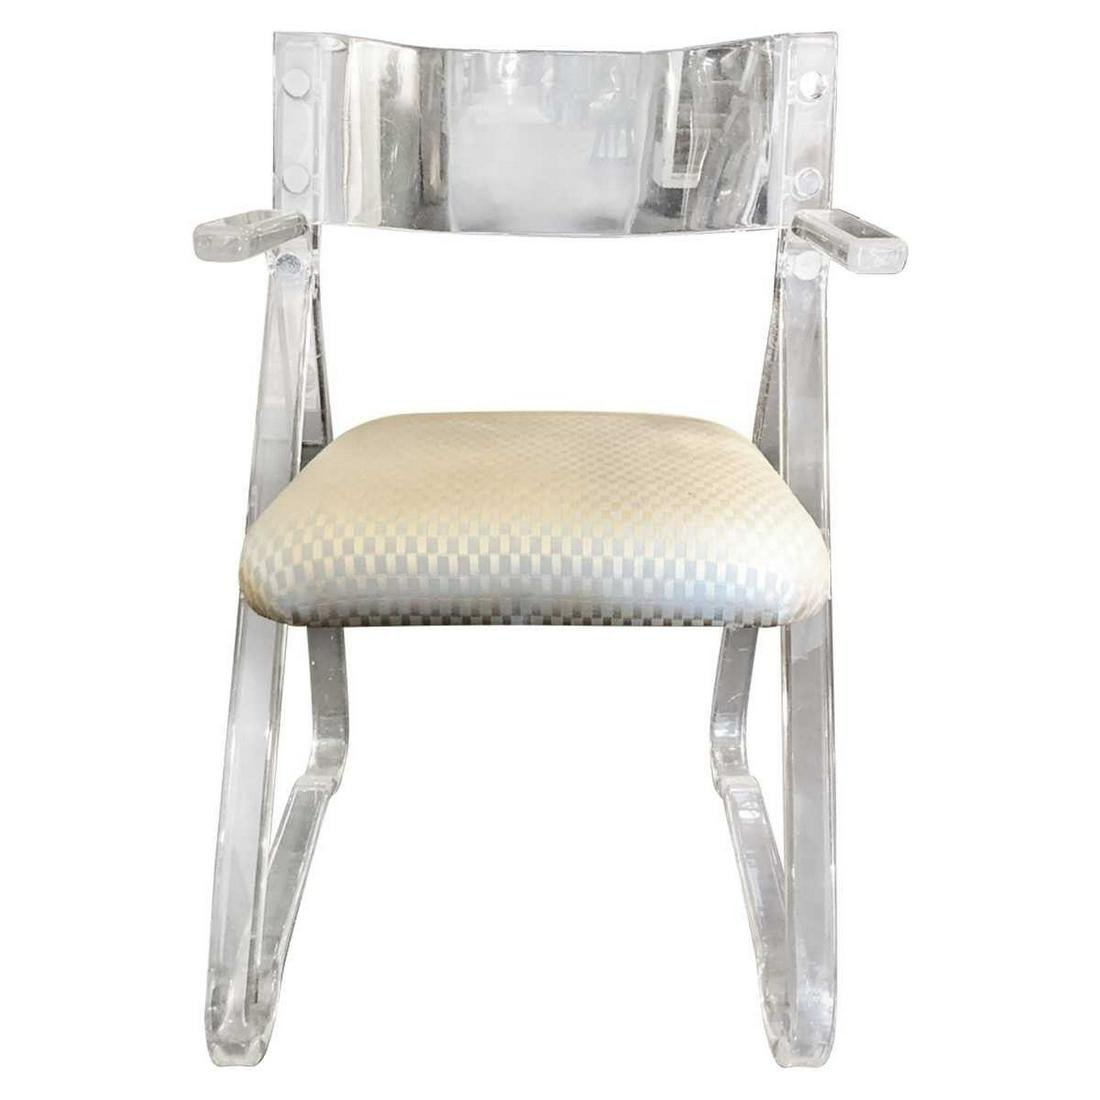 Italian Modern Mid Centruy Lucite Armchair with